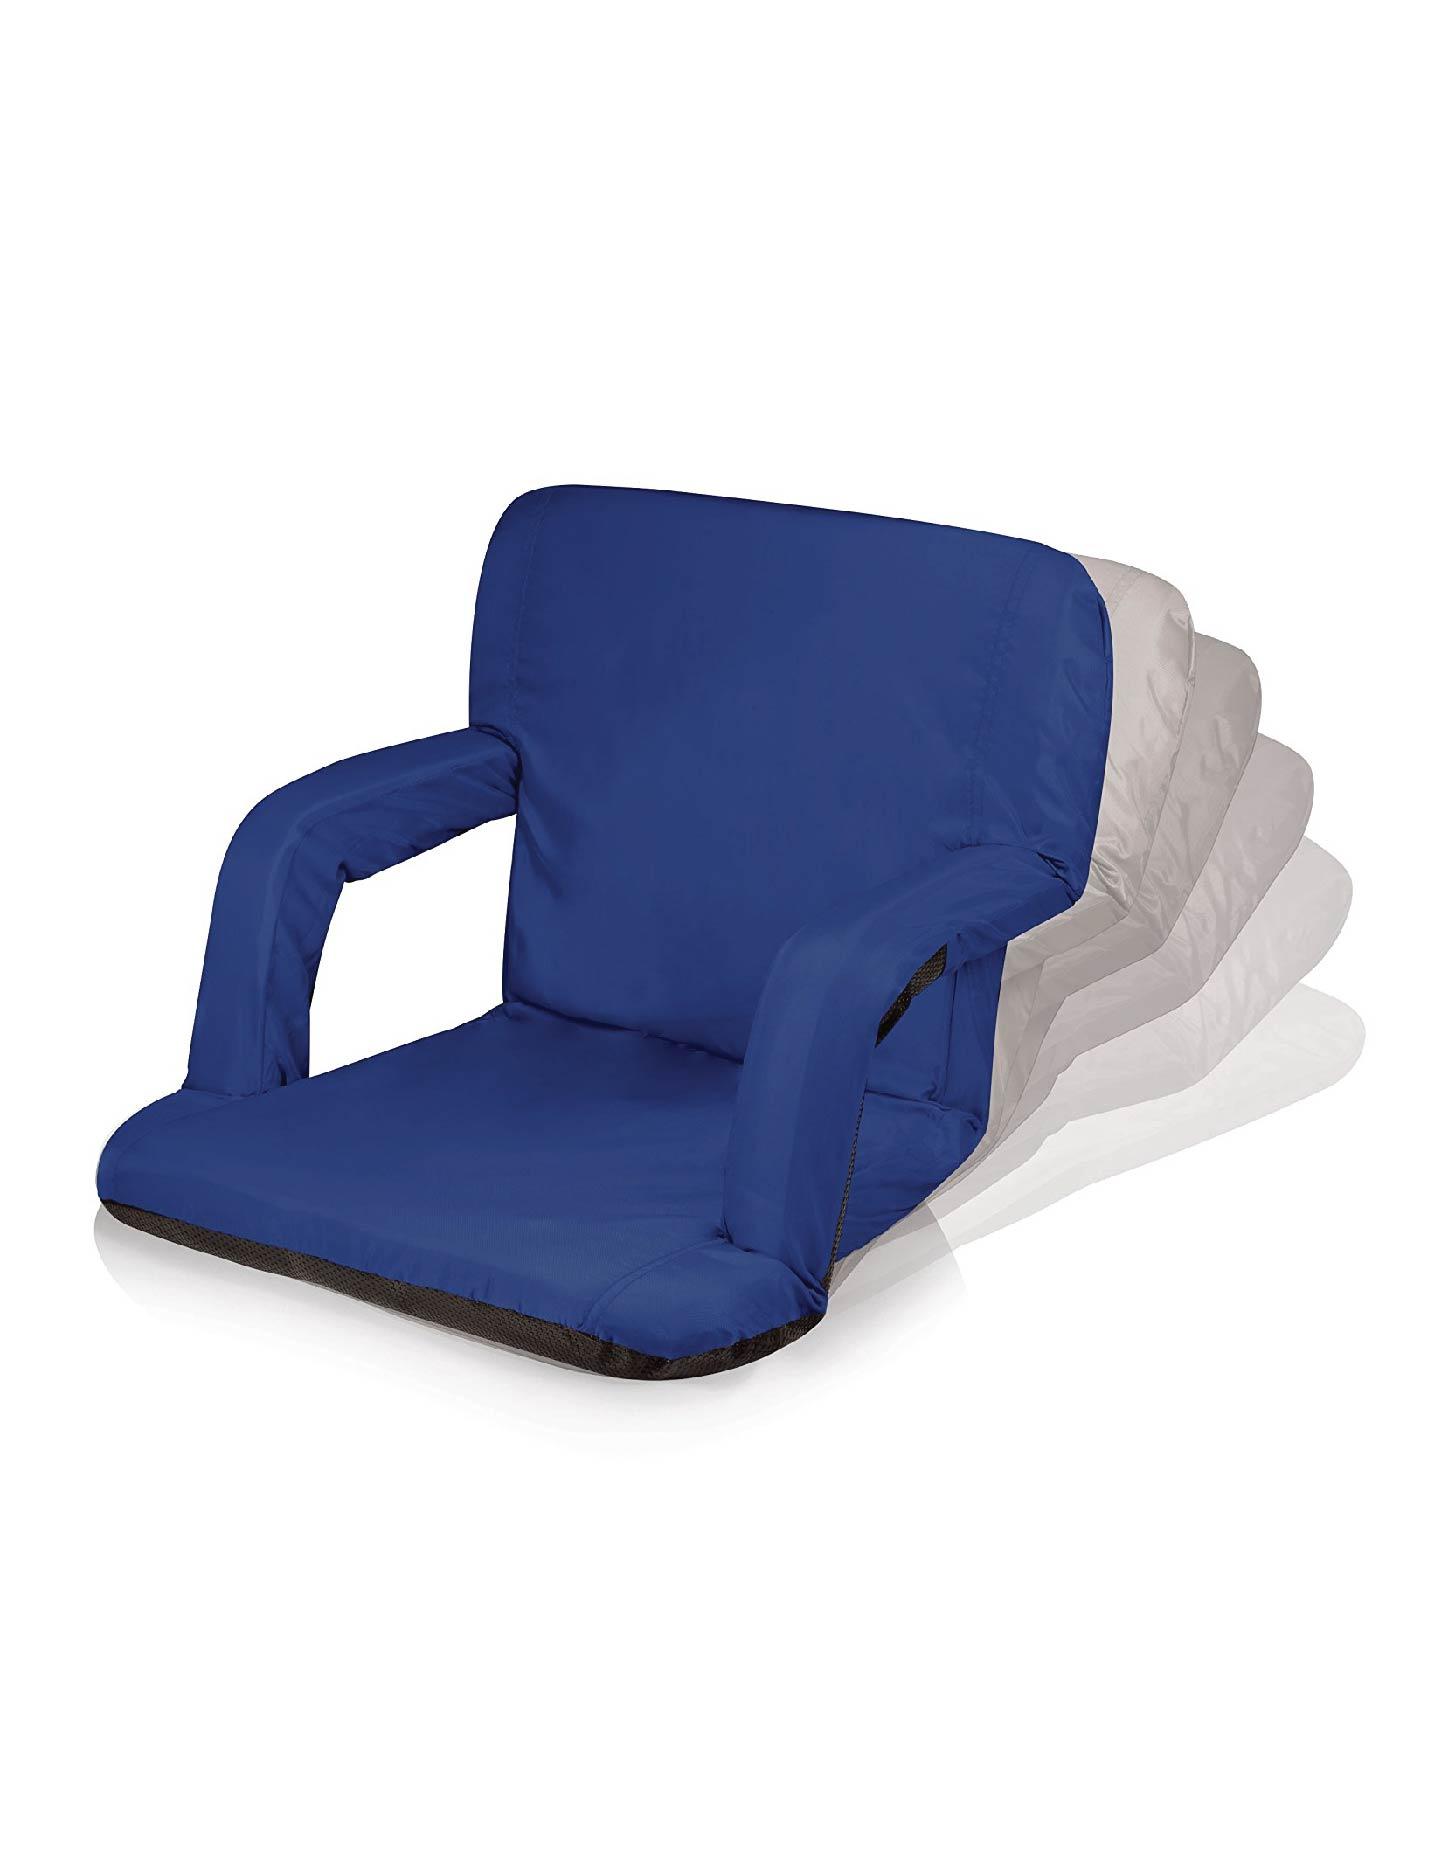 Folding Chairs Picnic Chair Design Ideas